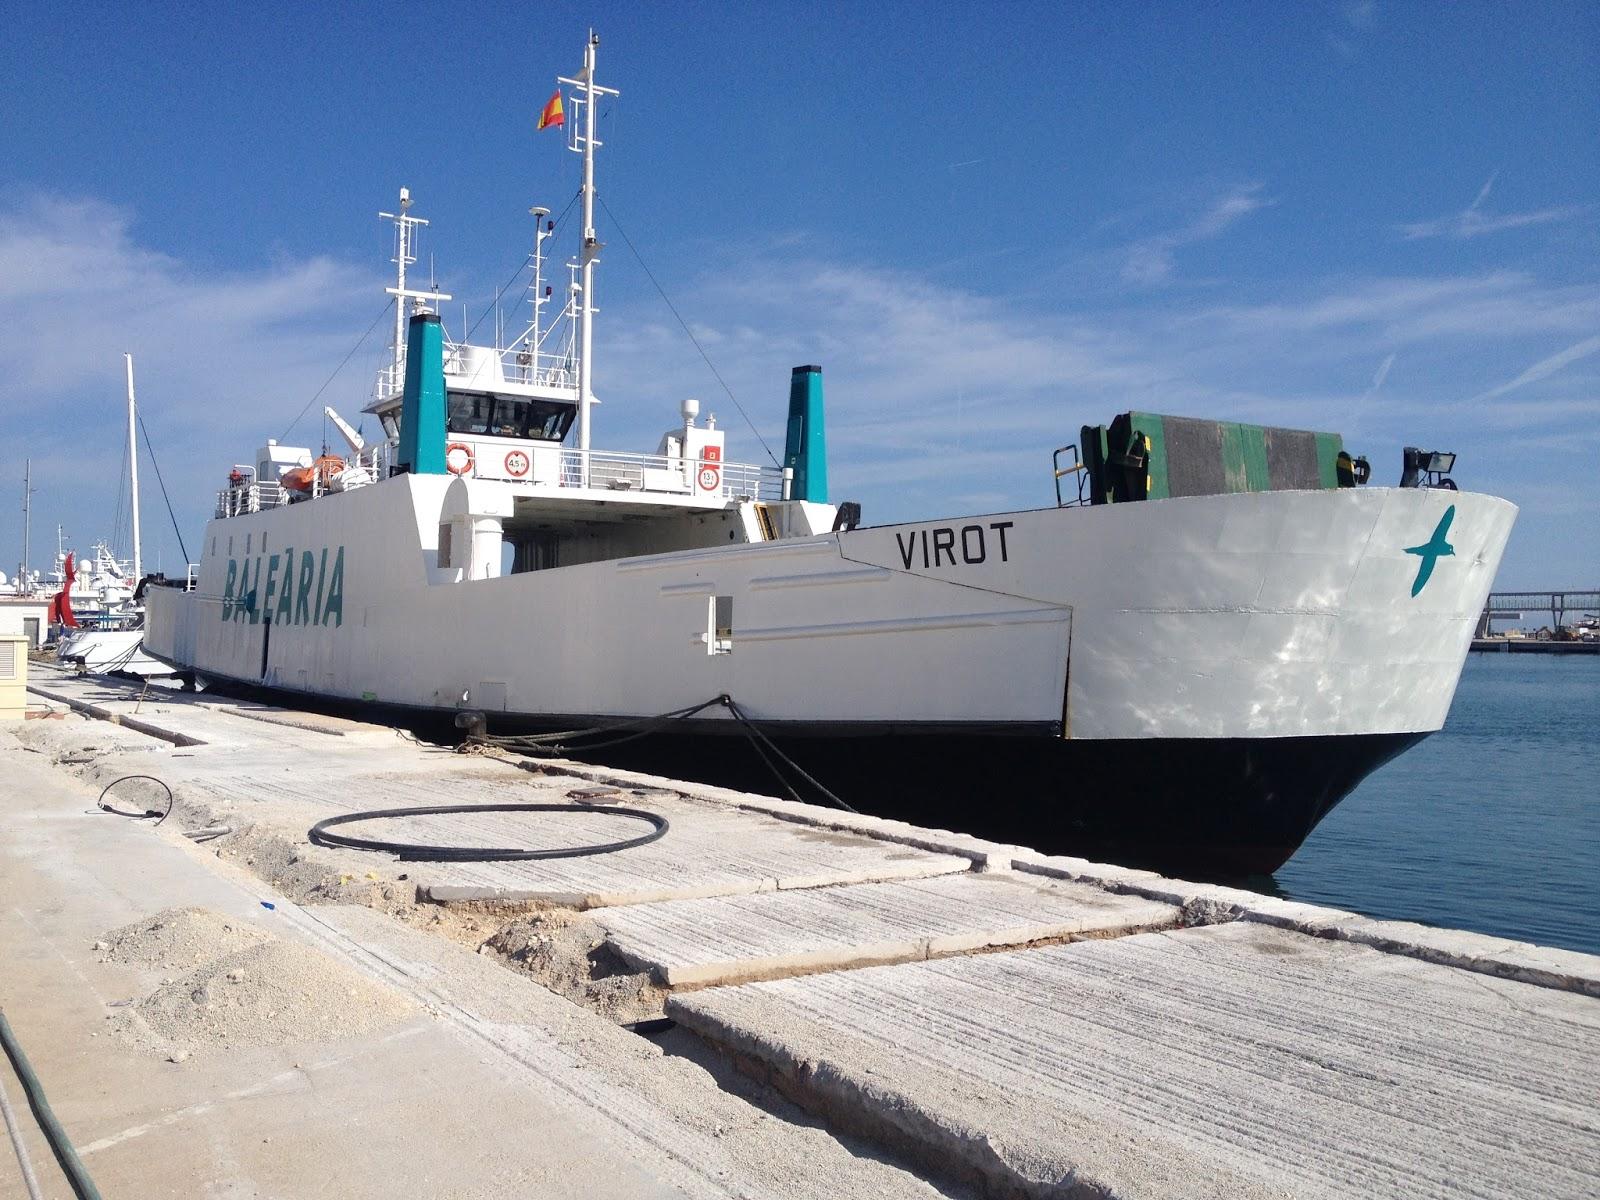 Ferrybalear el doble ended virot de bale ria rumbo a ibiza for Oficina balearia ibiza